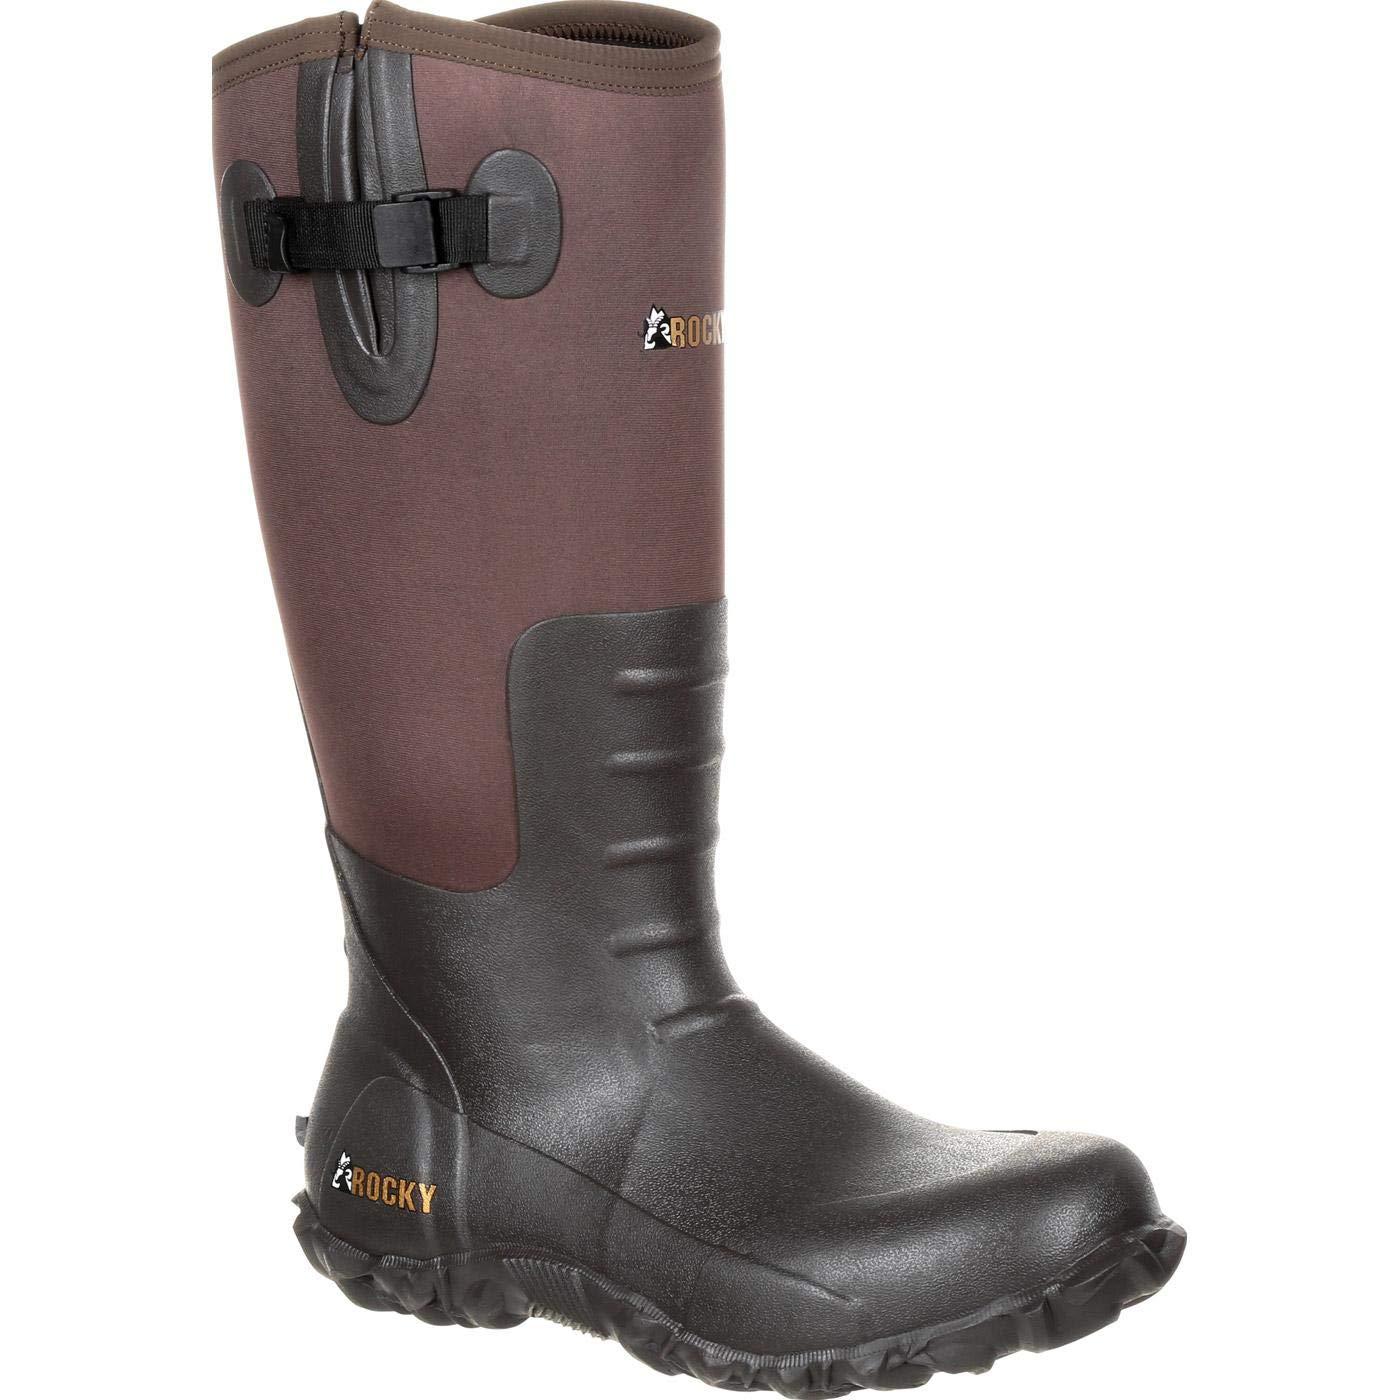 Boot Rks0240 Rocky Mid Calf Men's orxWECQdBe